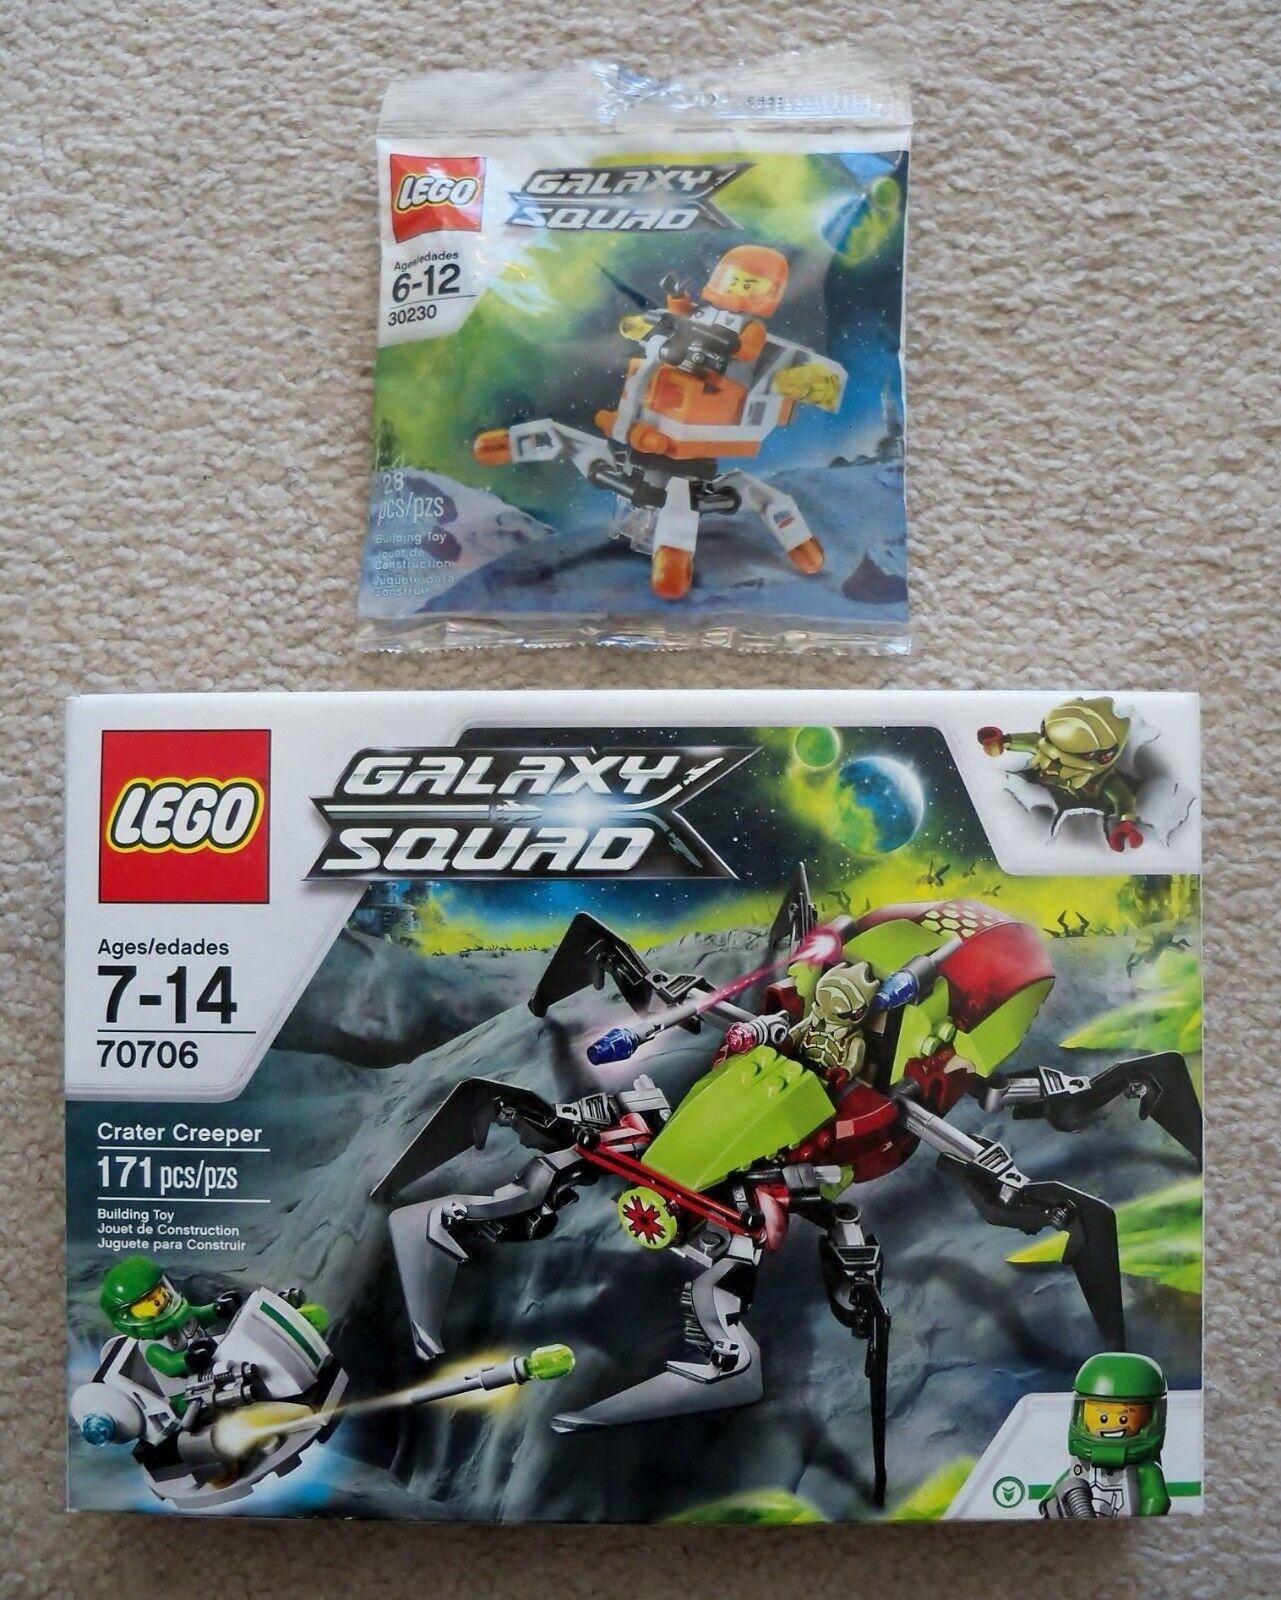 LEGO Galaxy Galaxy Galaxy Squad - 70706 Crater Creeper & 30230 Mini Mech - New & Sealed 11bba3